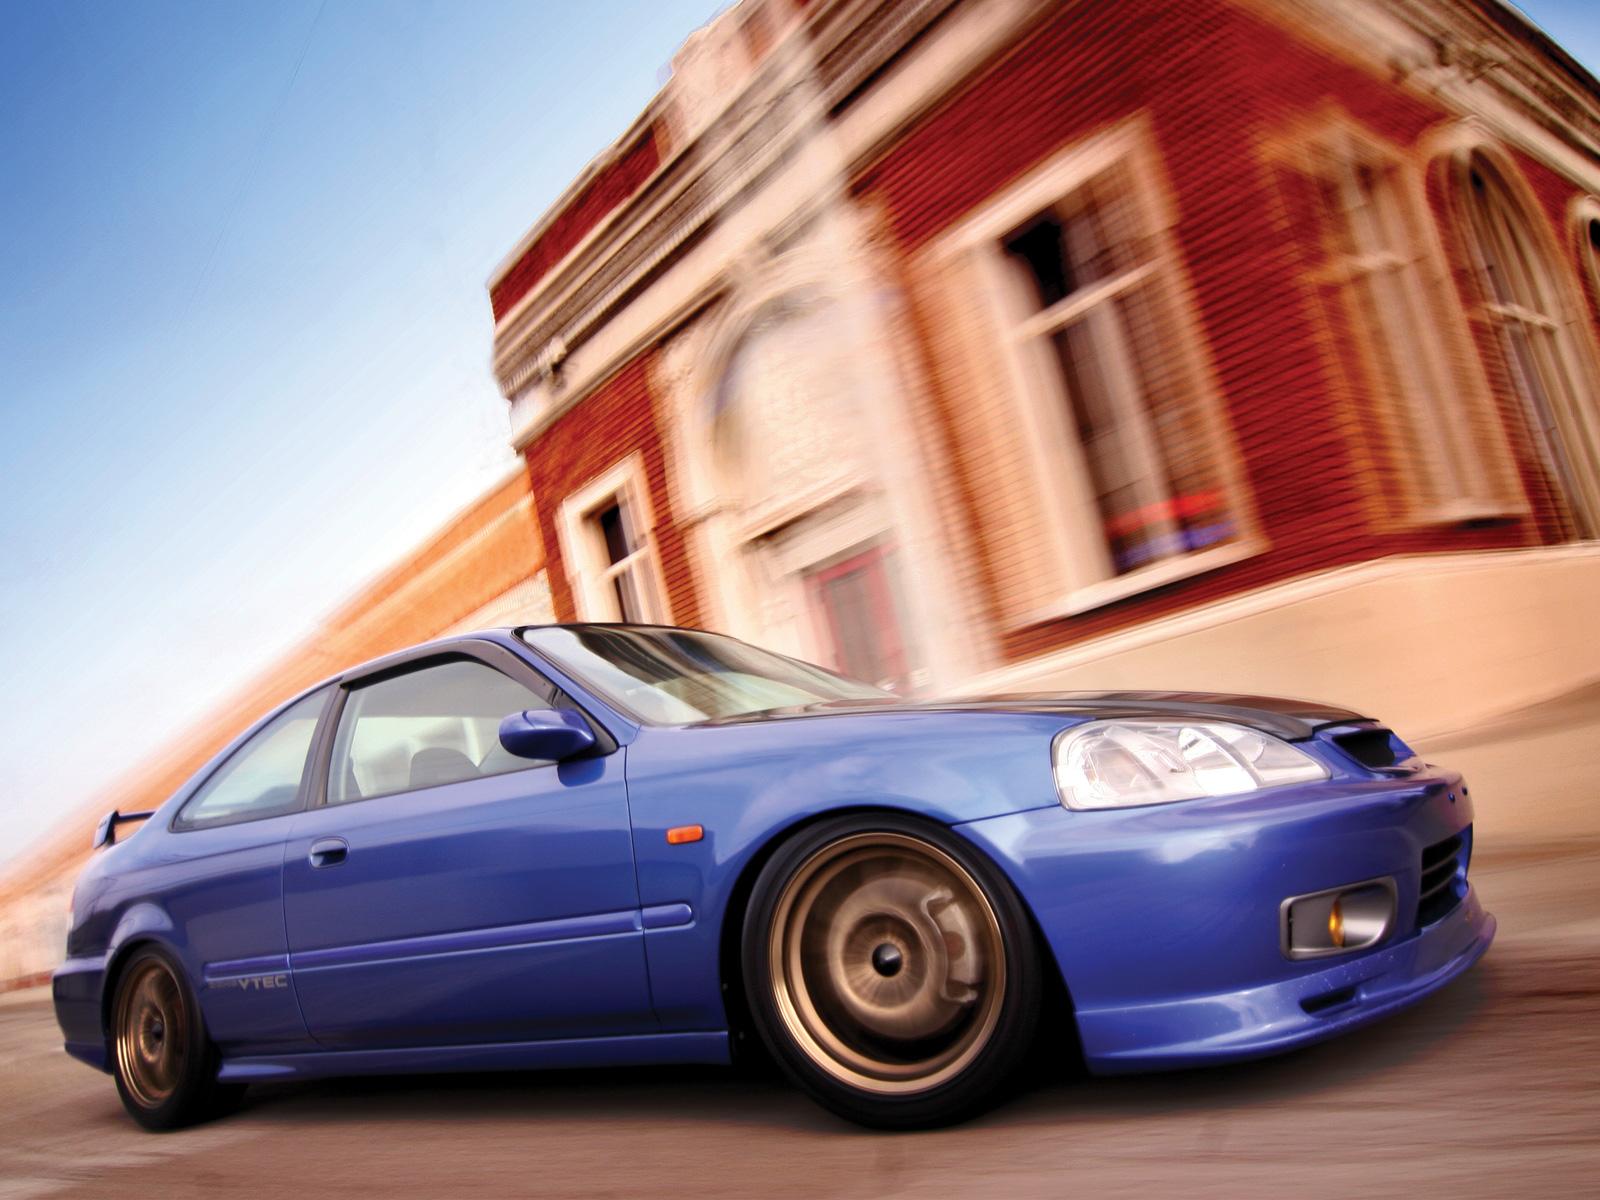 99 honda civic 2 door coupe